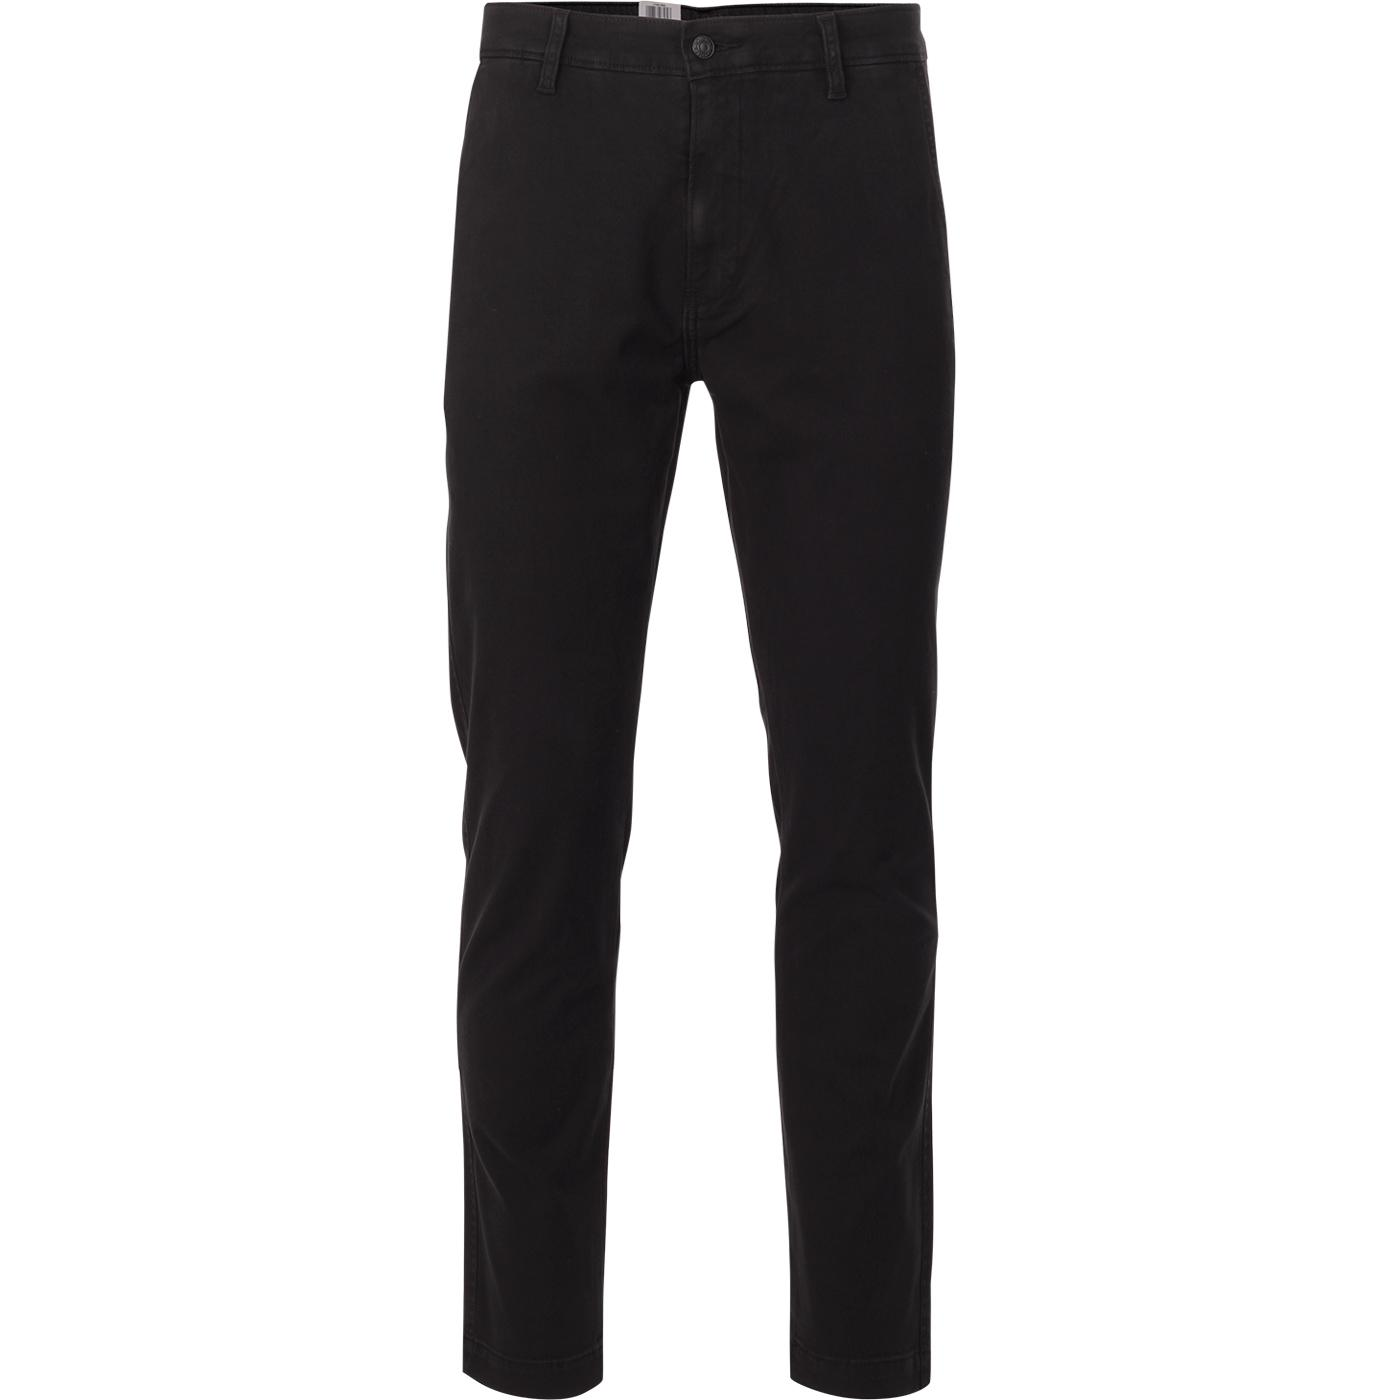 LEVI'S Standard Taper XX Chino Trousers (Black)